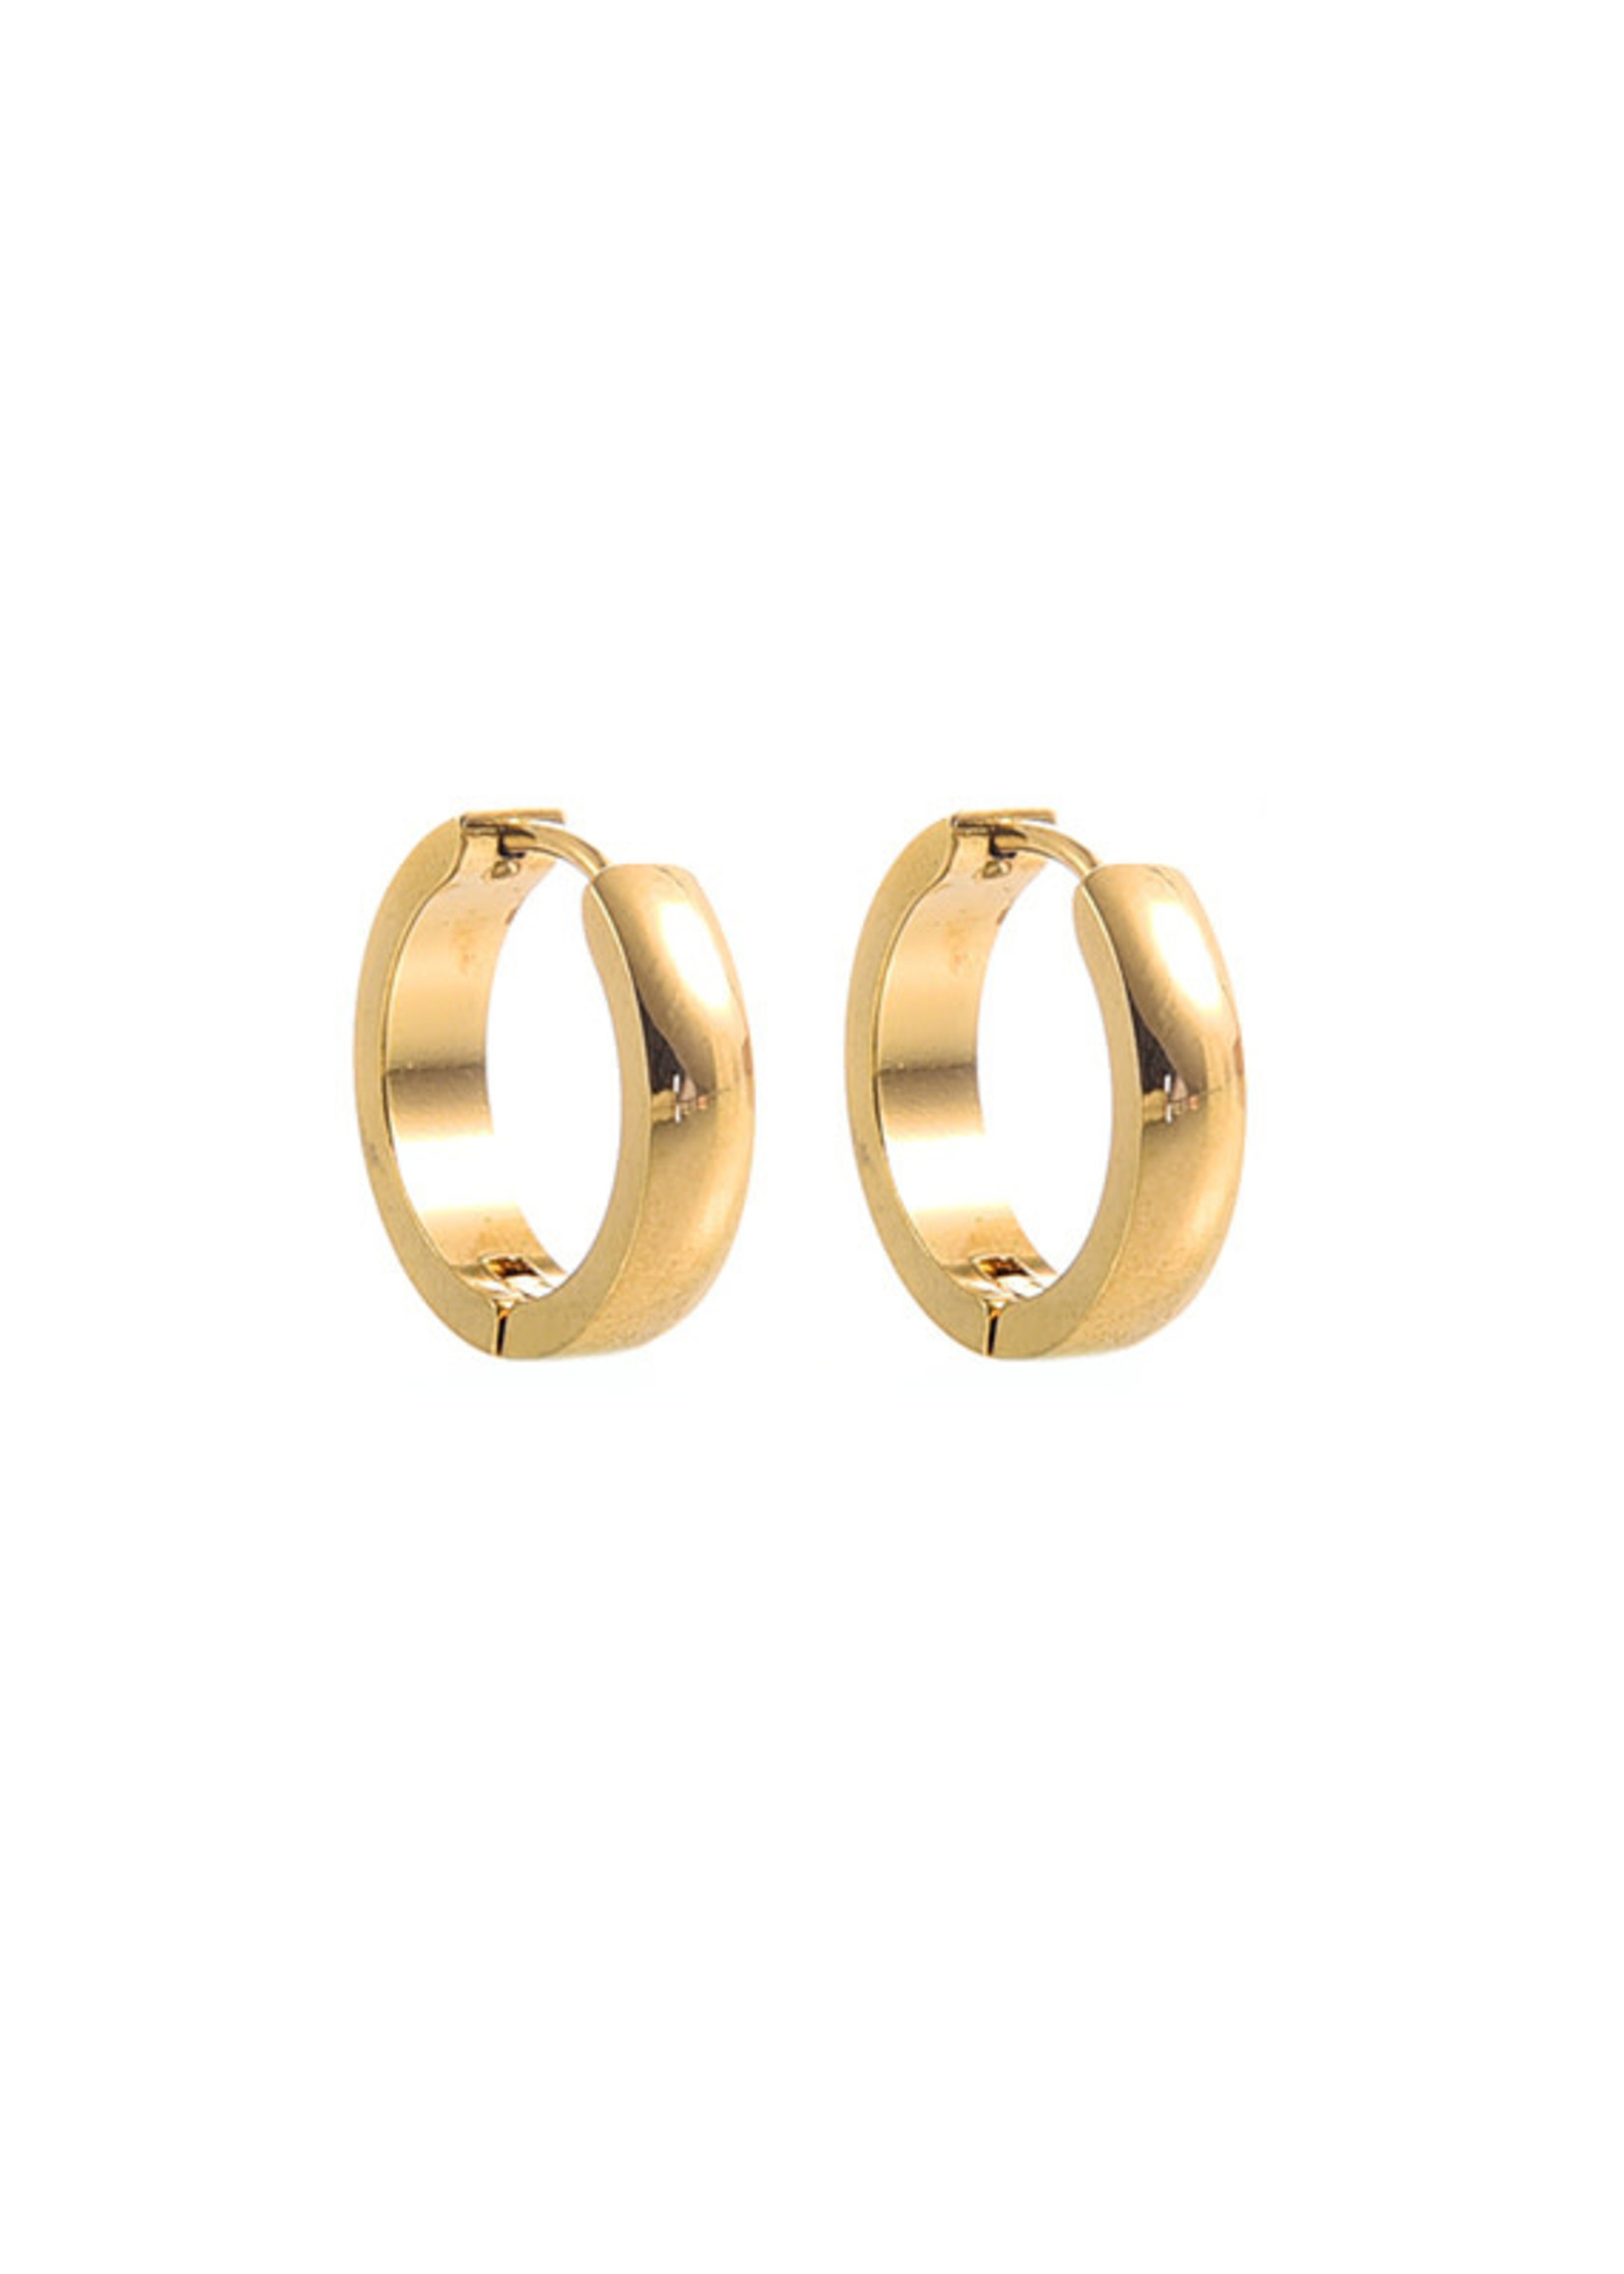 Oorbel goud creool 18mm E7004-2